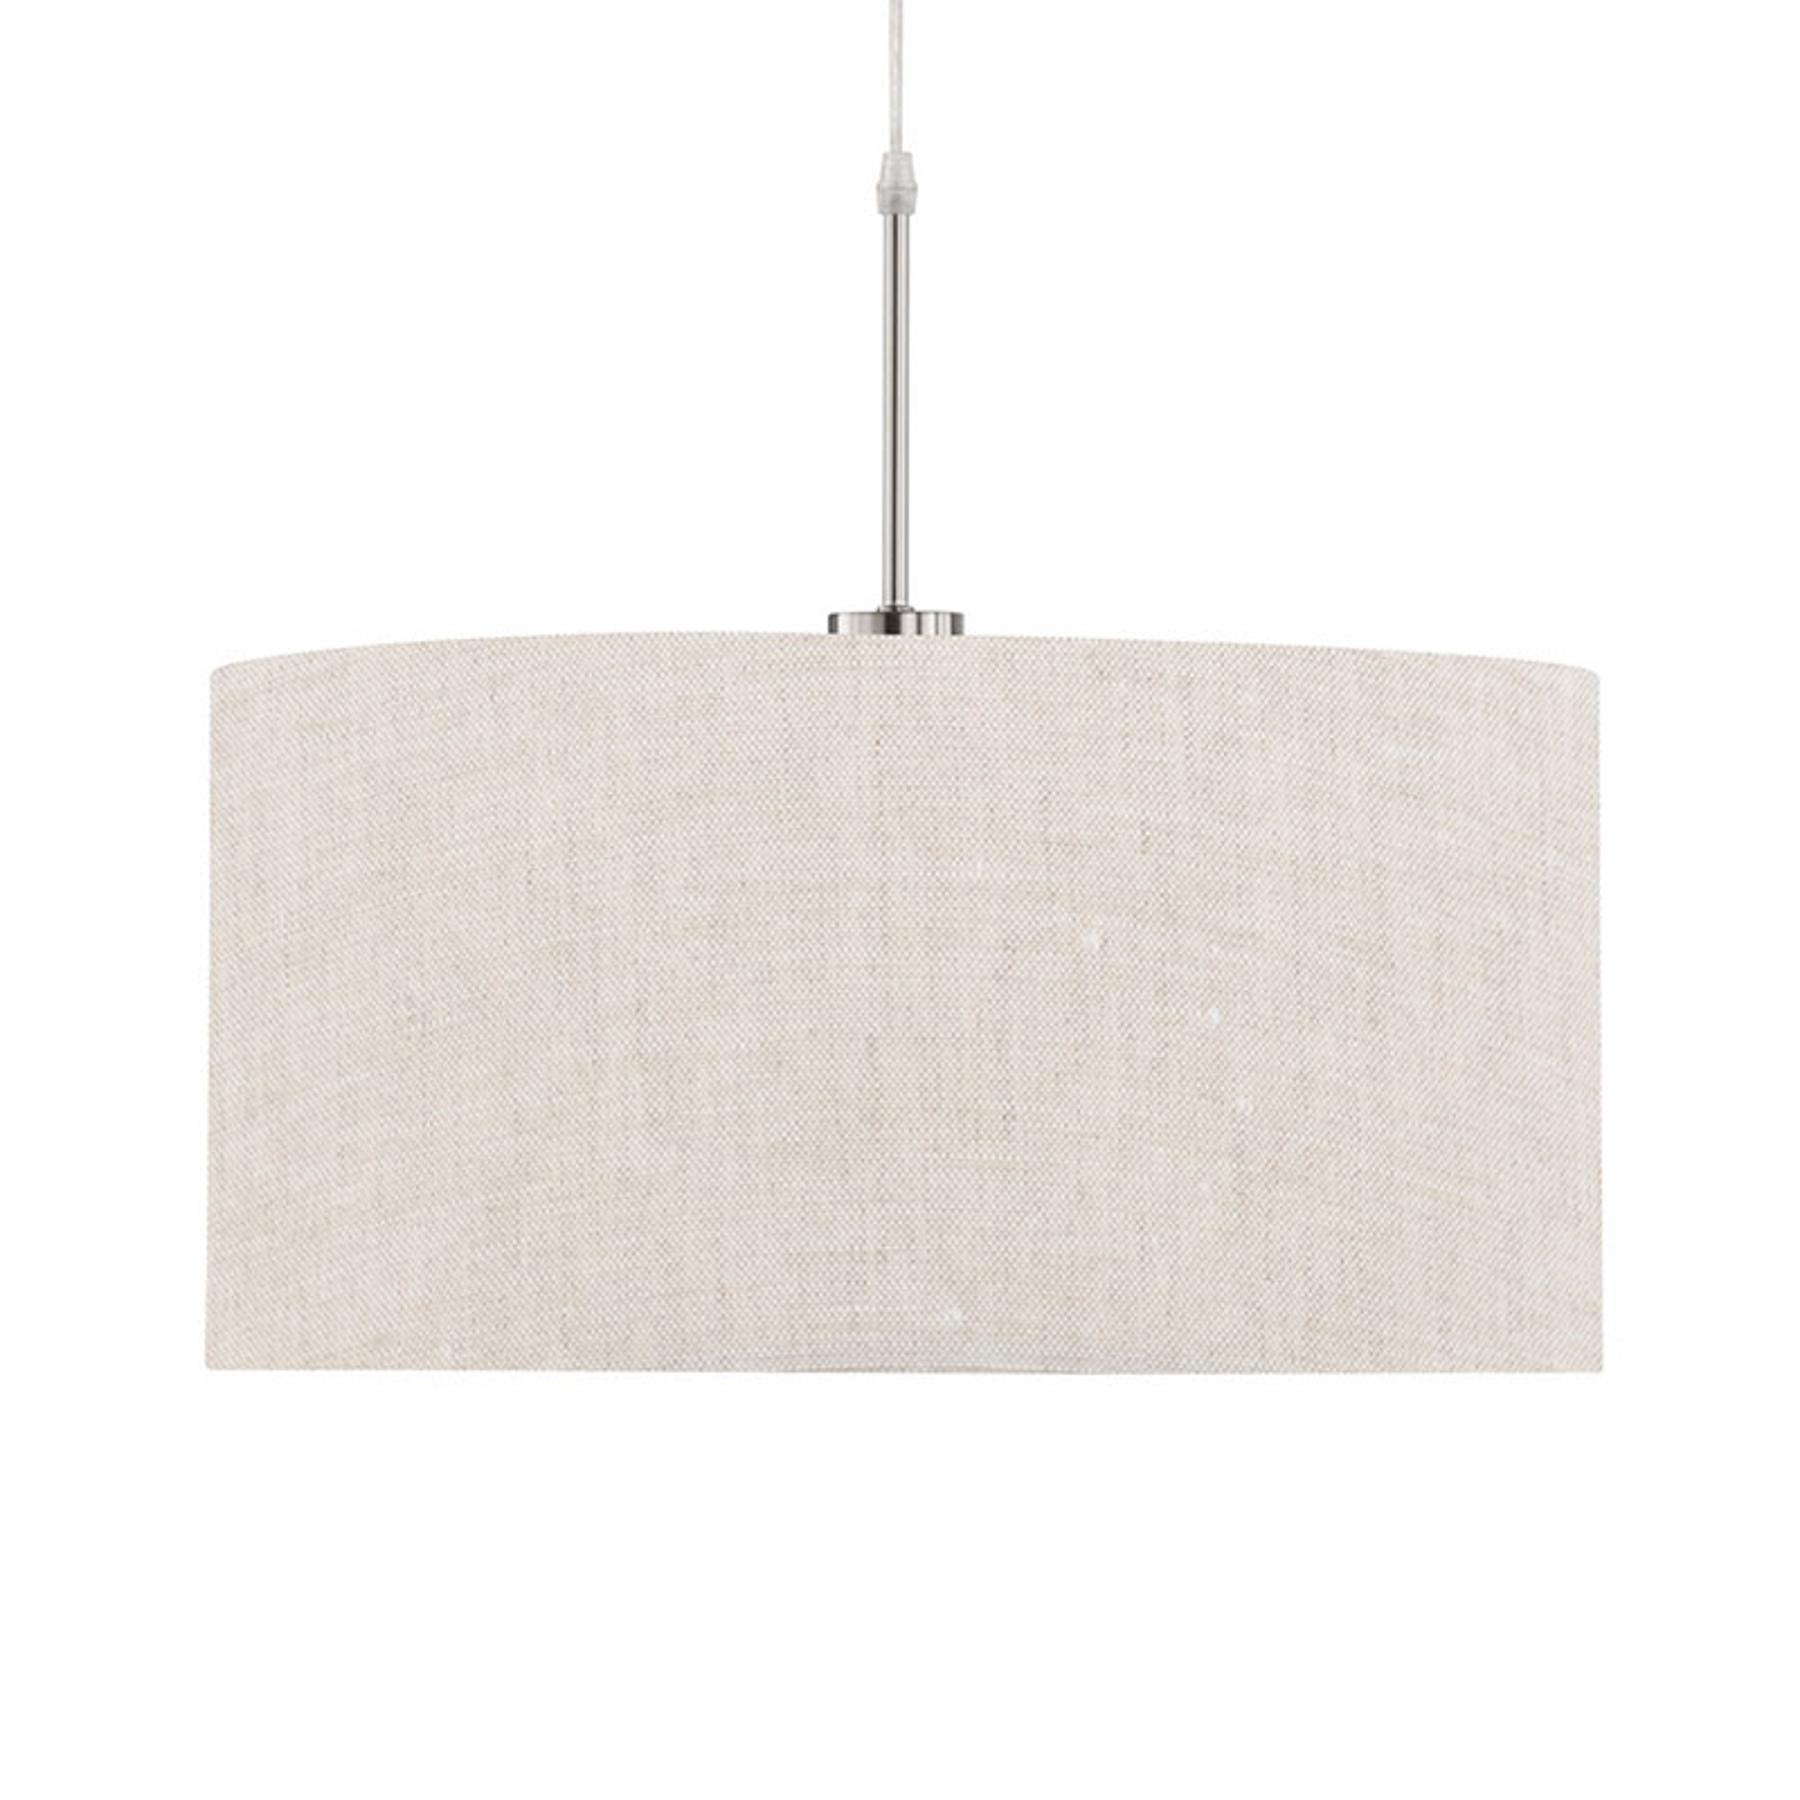 Lampa wisząca Marie tekstylny klosz, piasek Ø 50cm